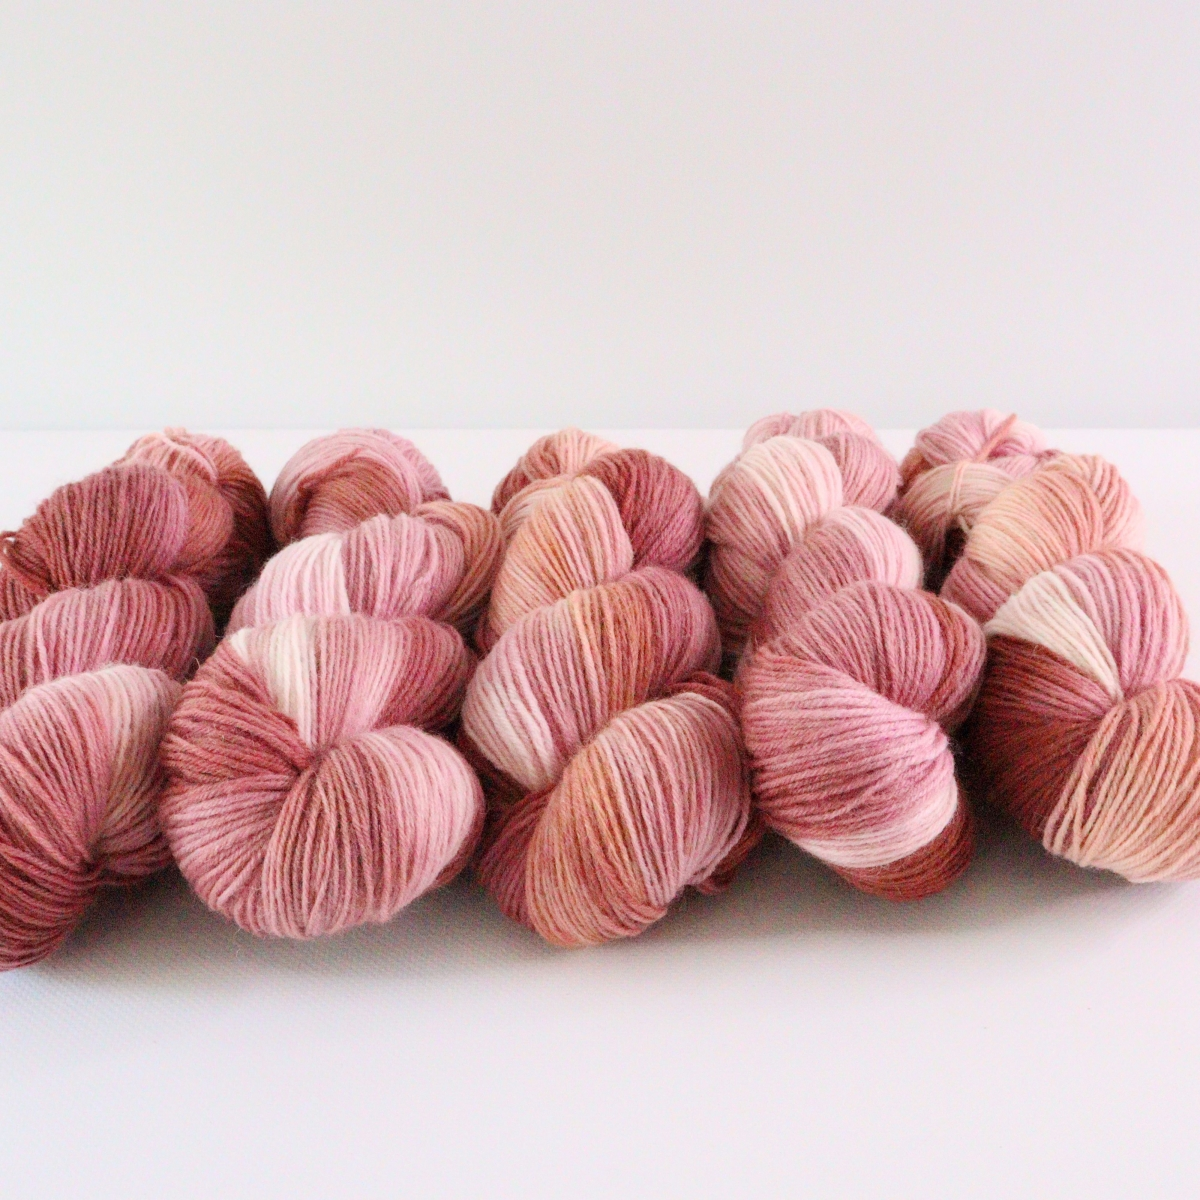 woodico.pro hand dyed yarn 075 4 1200x1200 - Hand dyed yarn / 075